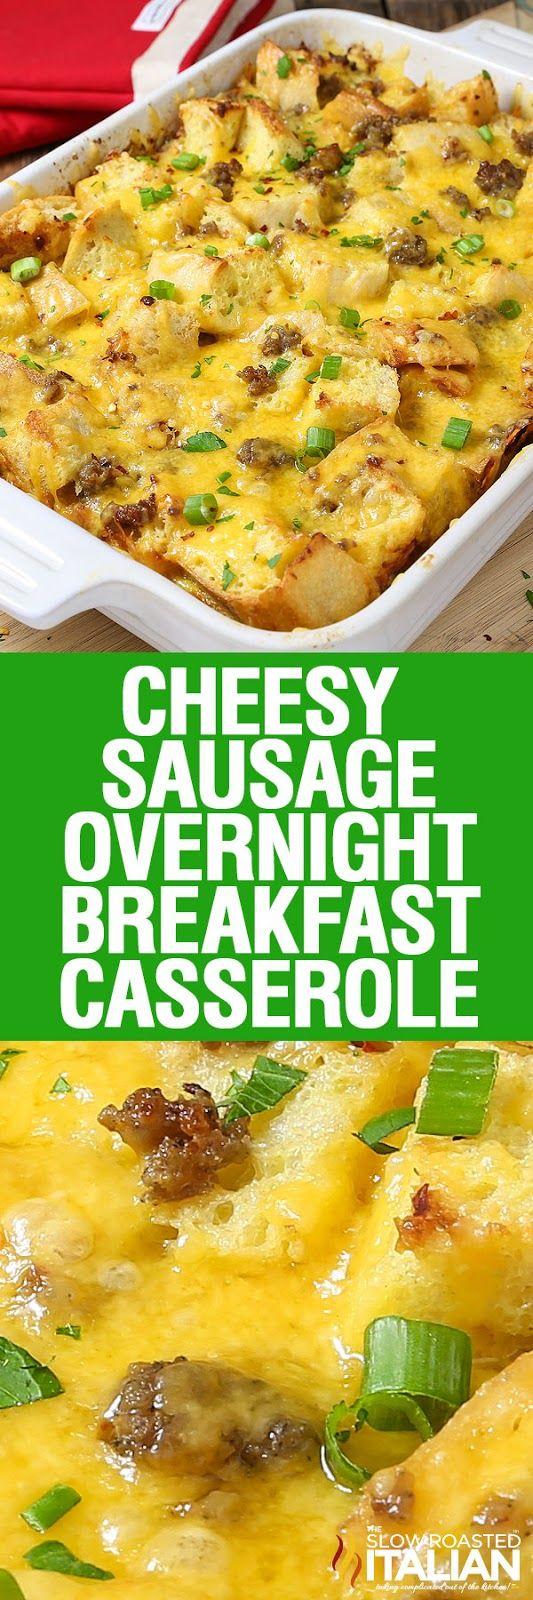 The Ultimate Christmas Breakfast Casserole #JonesFamilyRules @jonesdairyfarm #ad